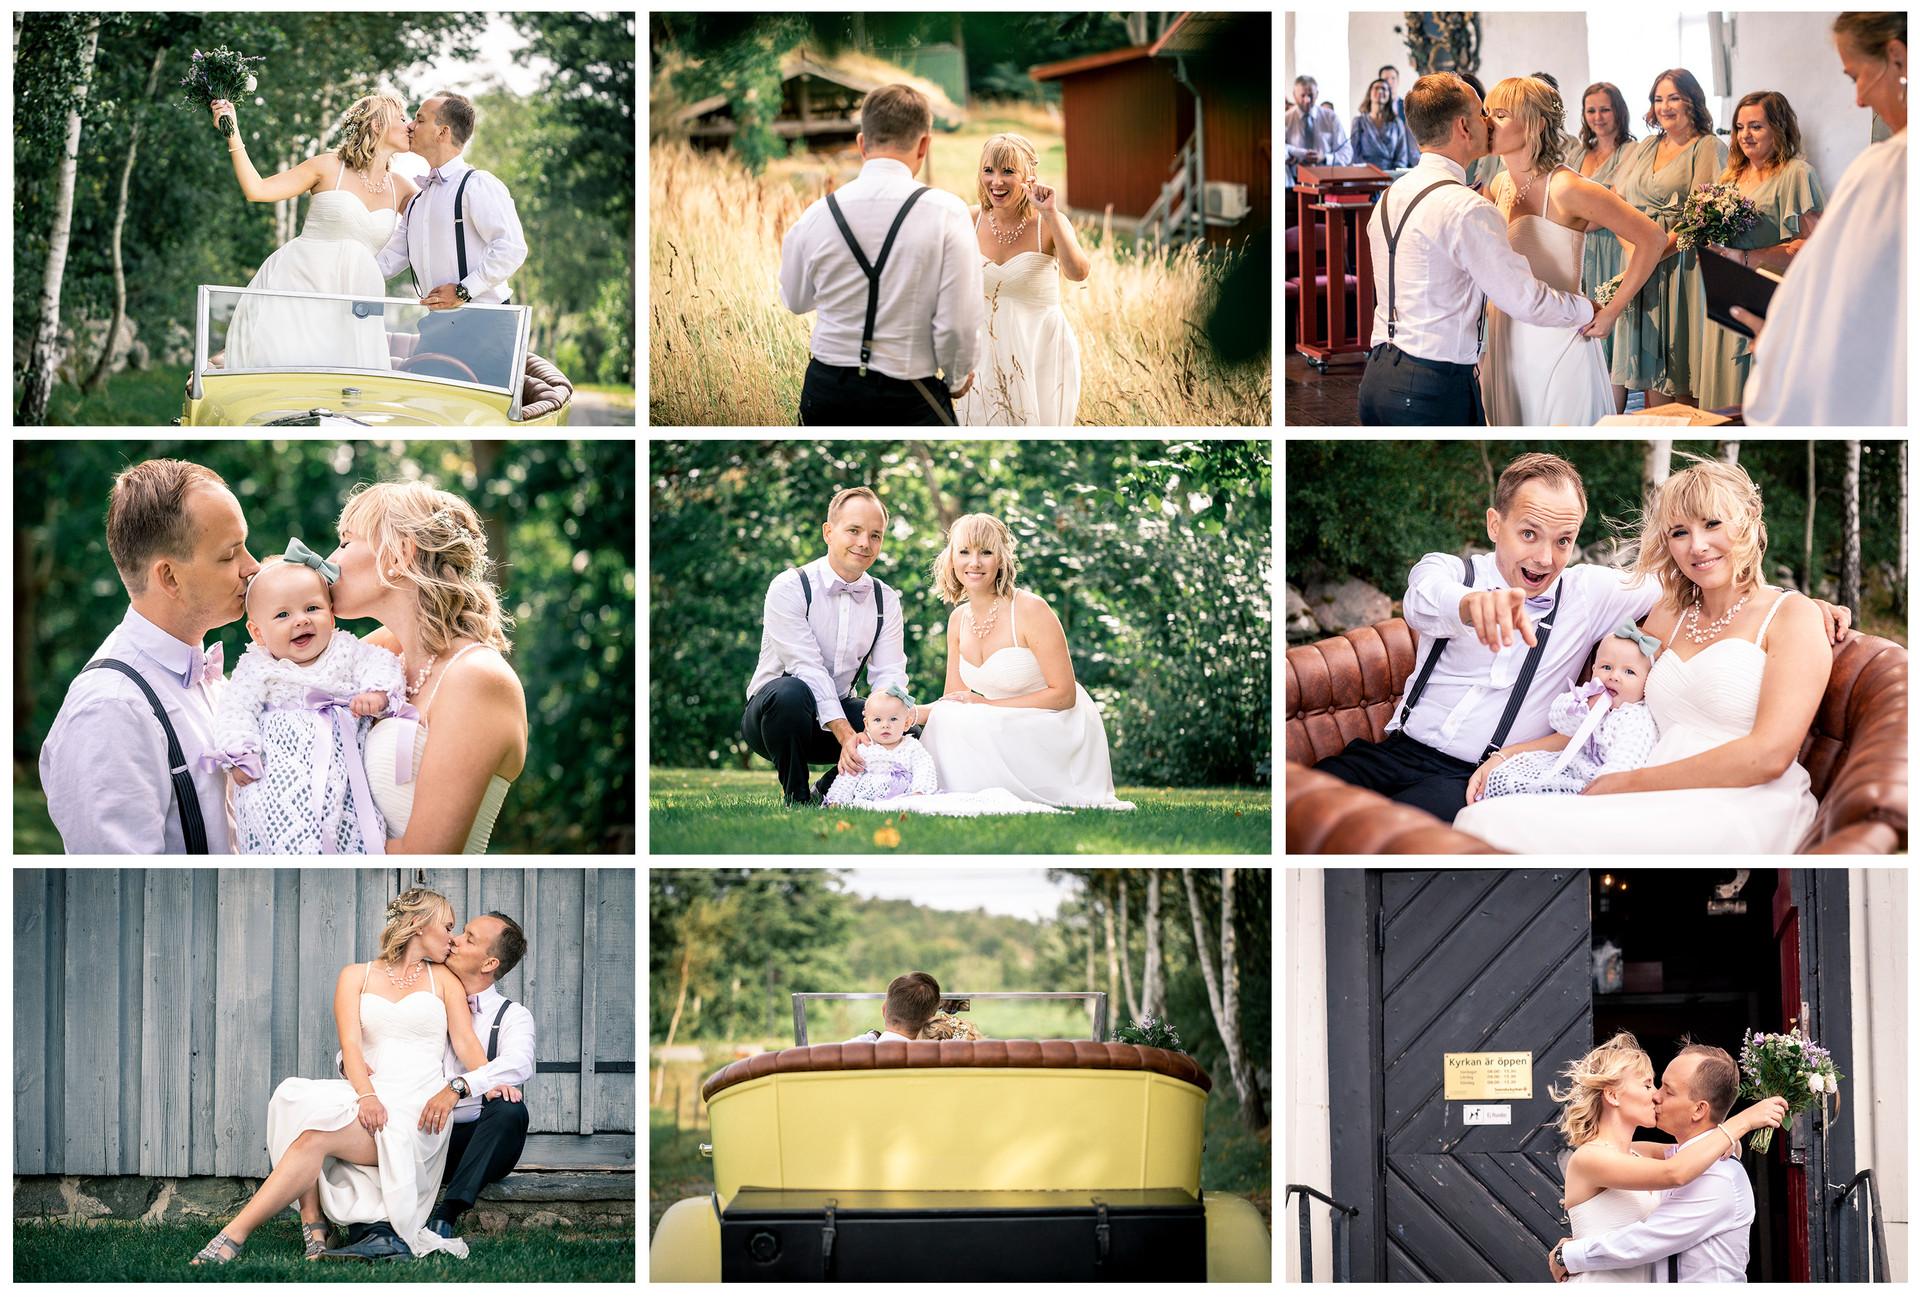 Wedding-Photography-Goteborg-03.jpg